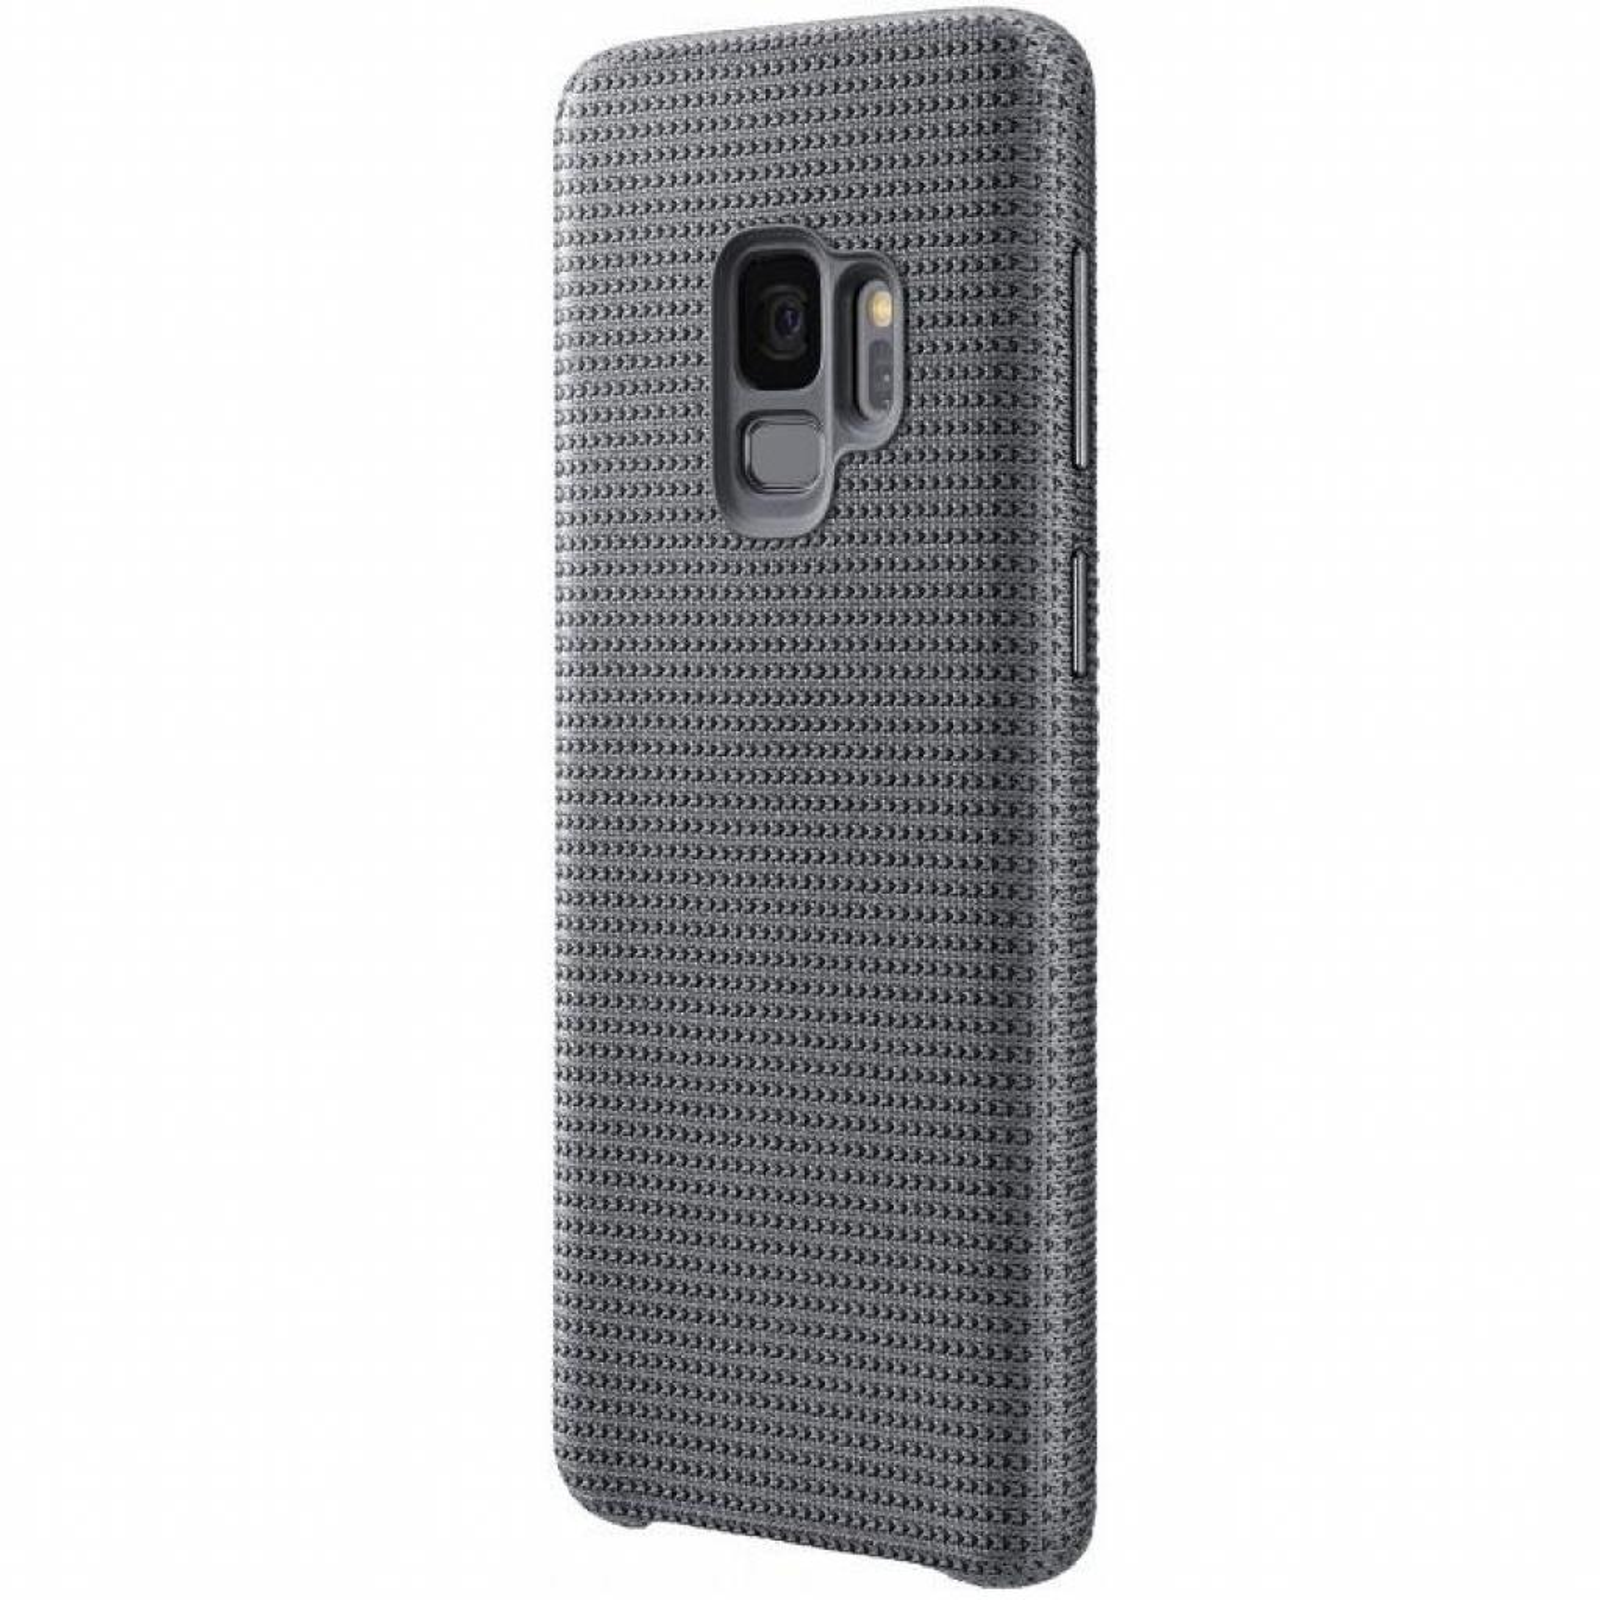 Чехол для моб. телефона Samsung для Galaxy S9 (G960) Hyperknit Cover Grey (EF-GG960FJEGRU) изображение 5